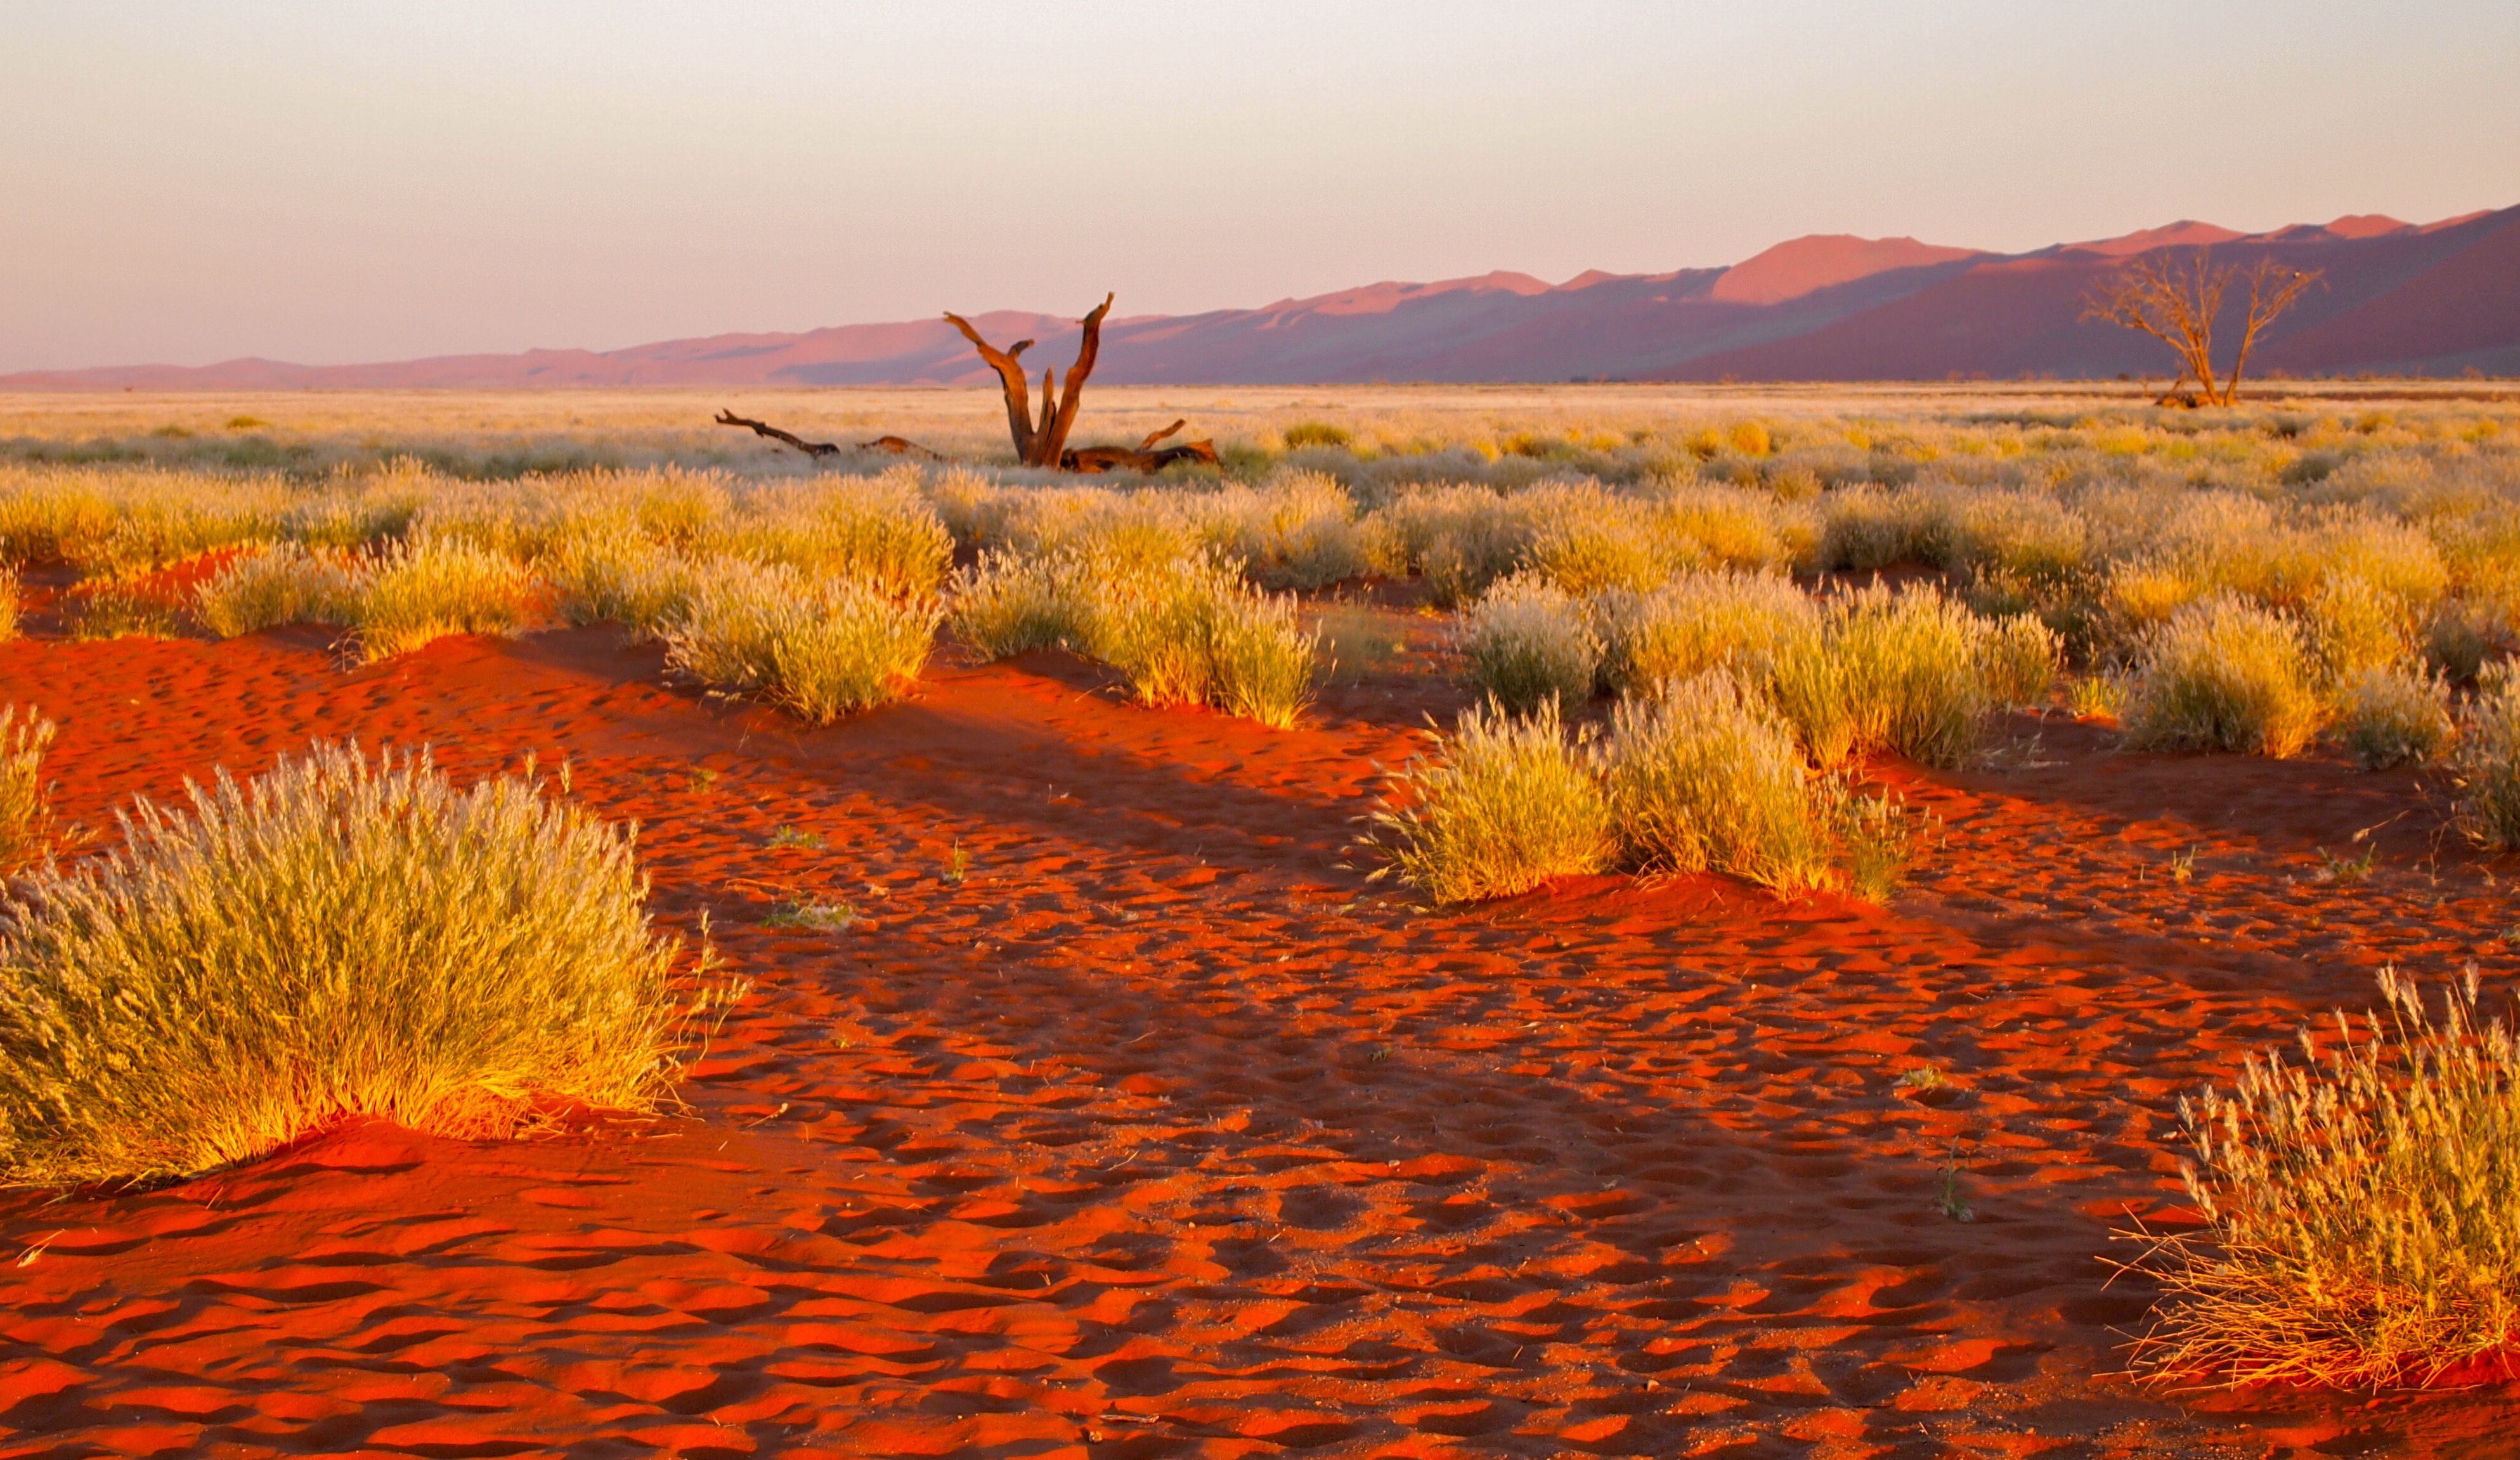 Kalahari Desert The Namid Desert In Namibia Africa Has